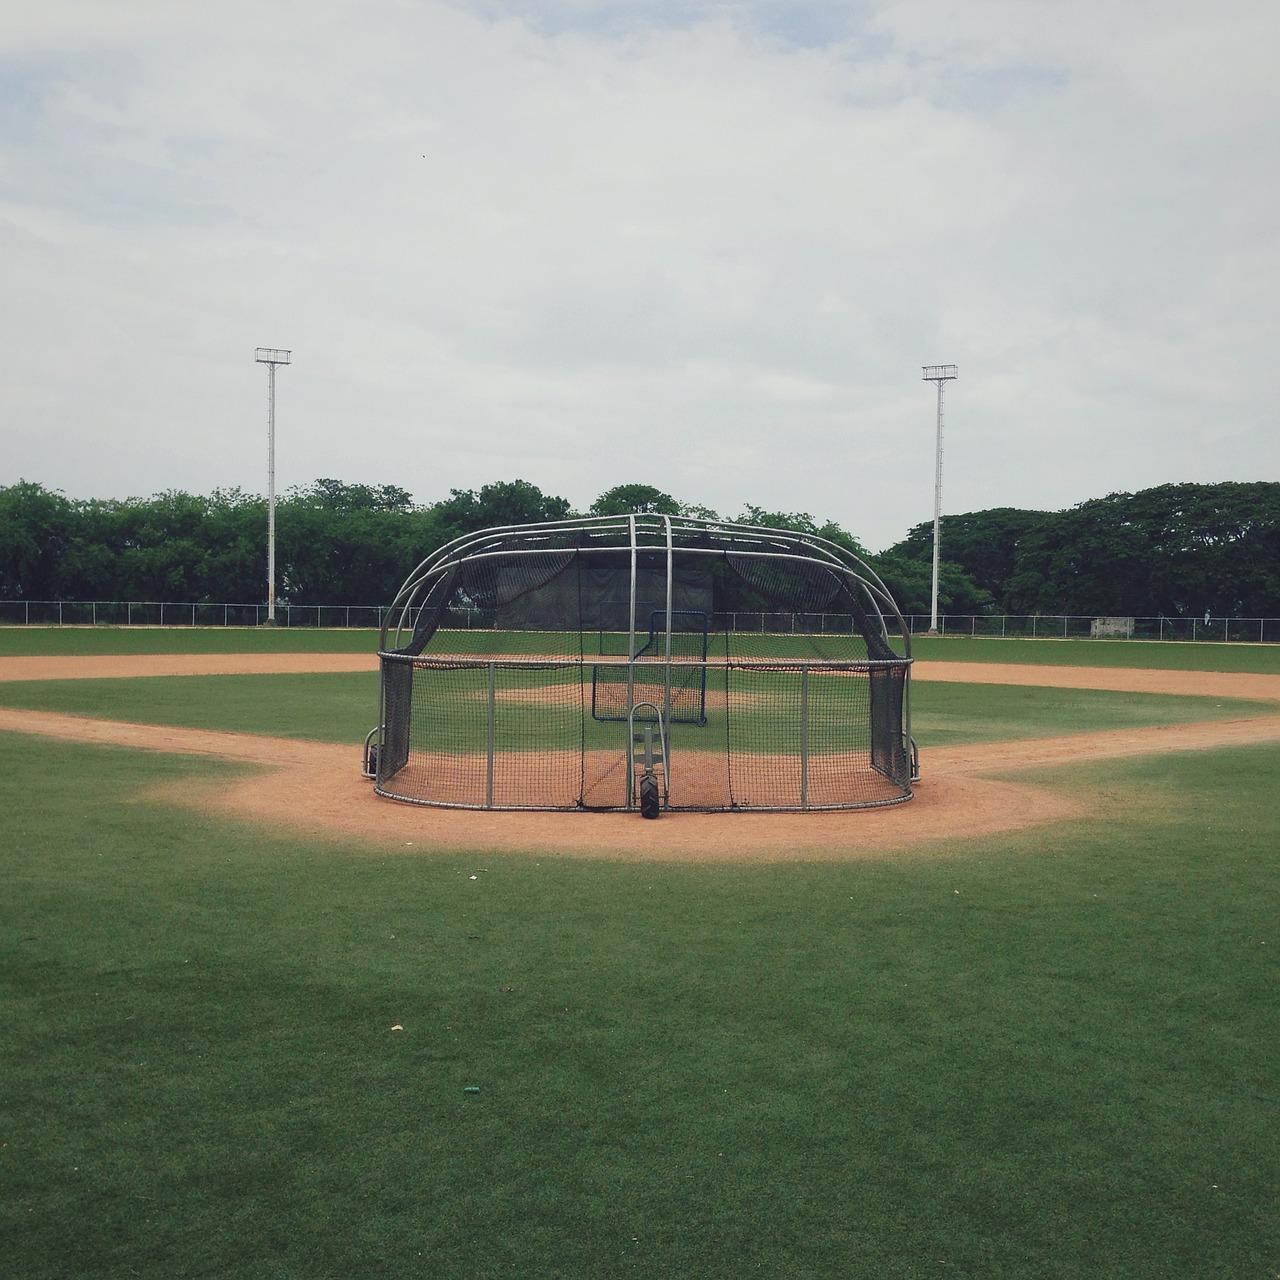 baseball-diamond-2619553_1280.jpg